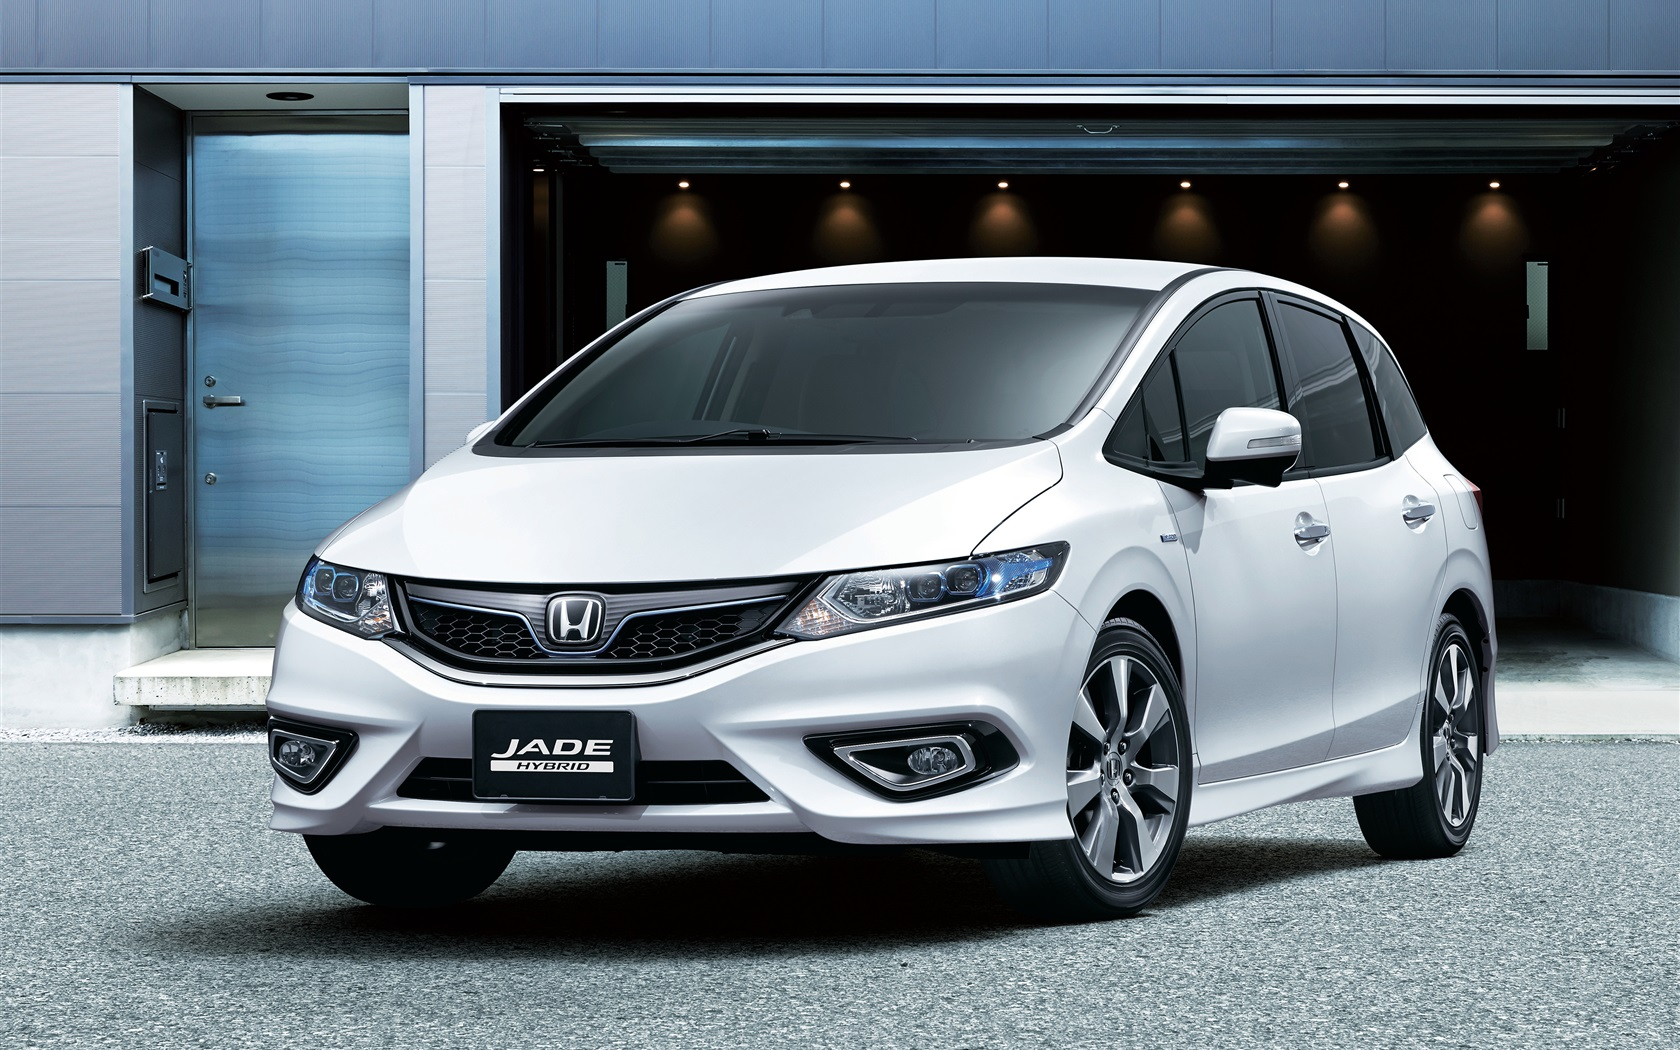 Honda Jade Hybrid Auto Vorderansicht 3840x2160 UHD 4K